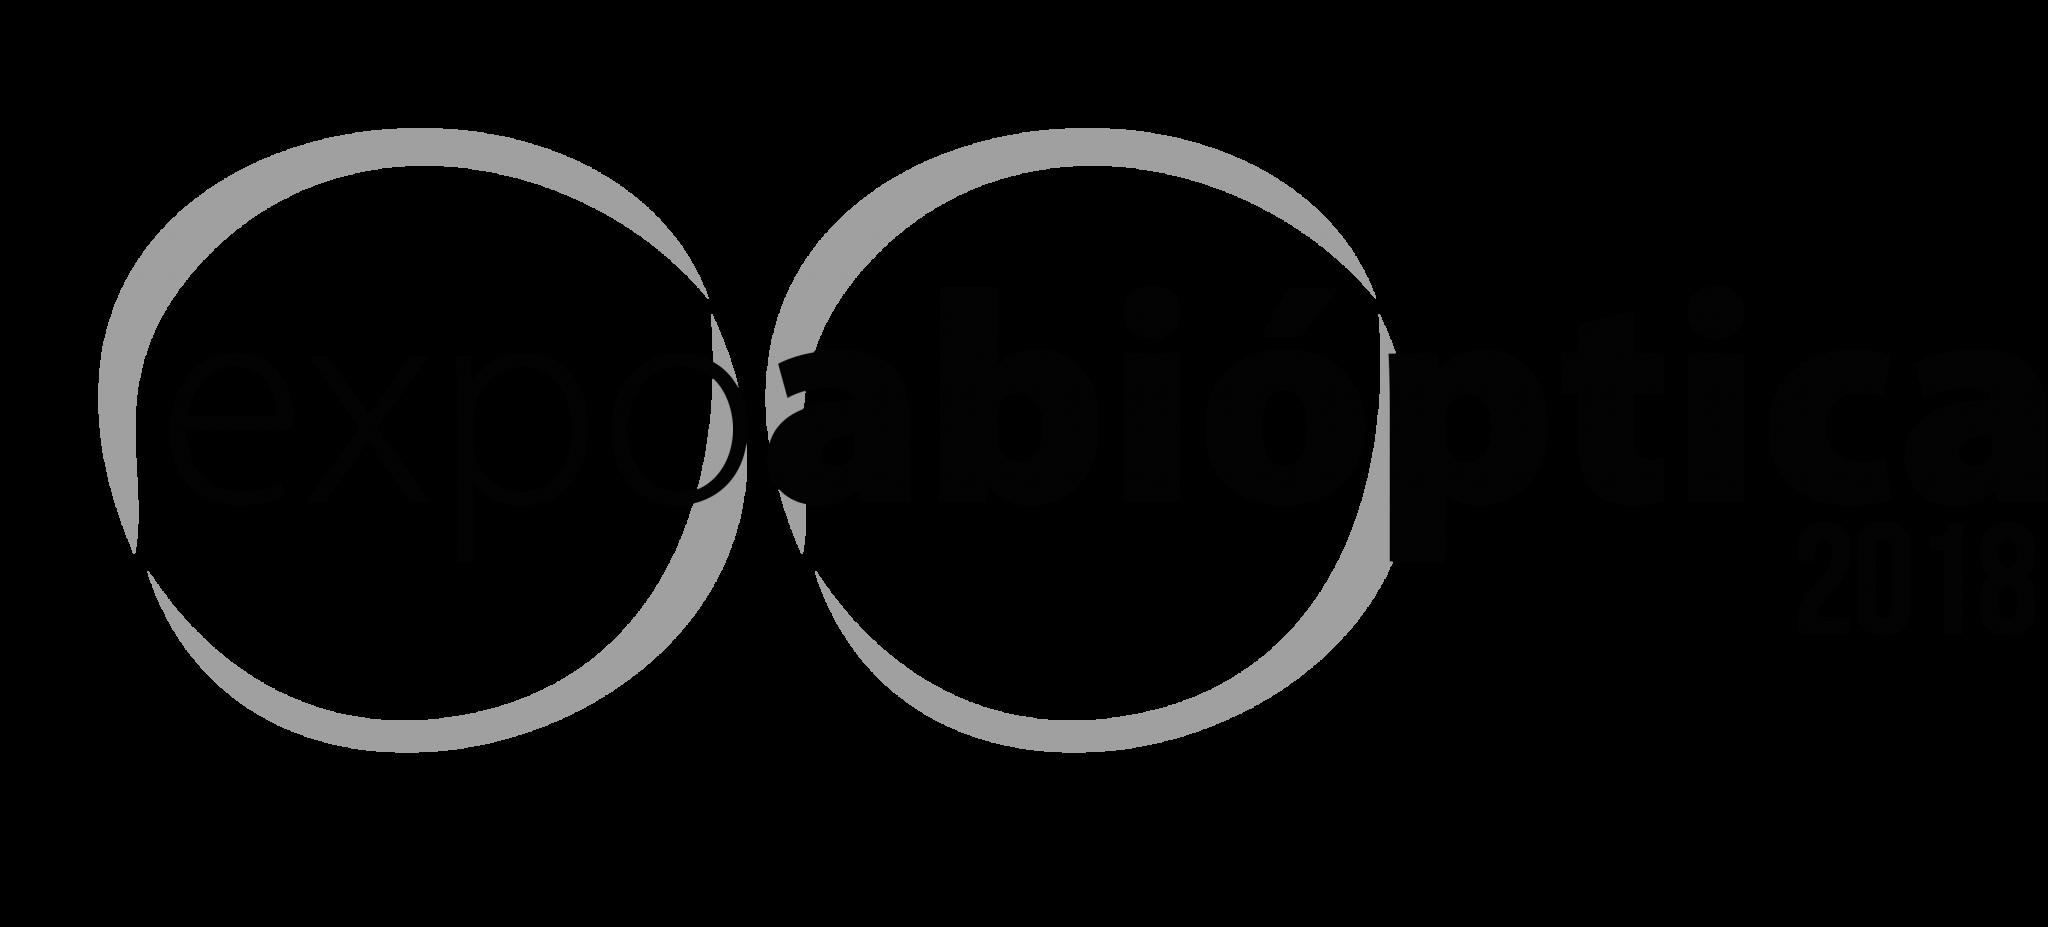 Expoabioptica2018